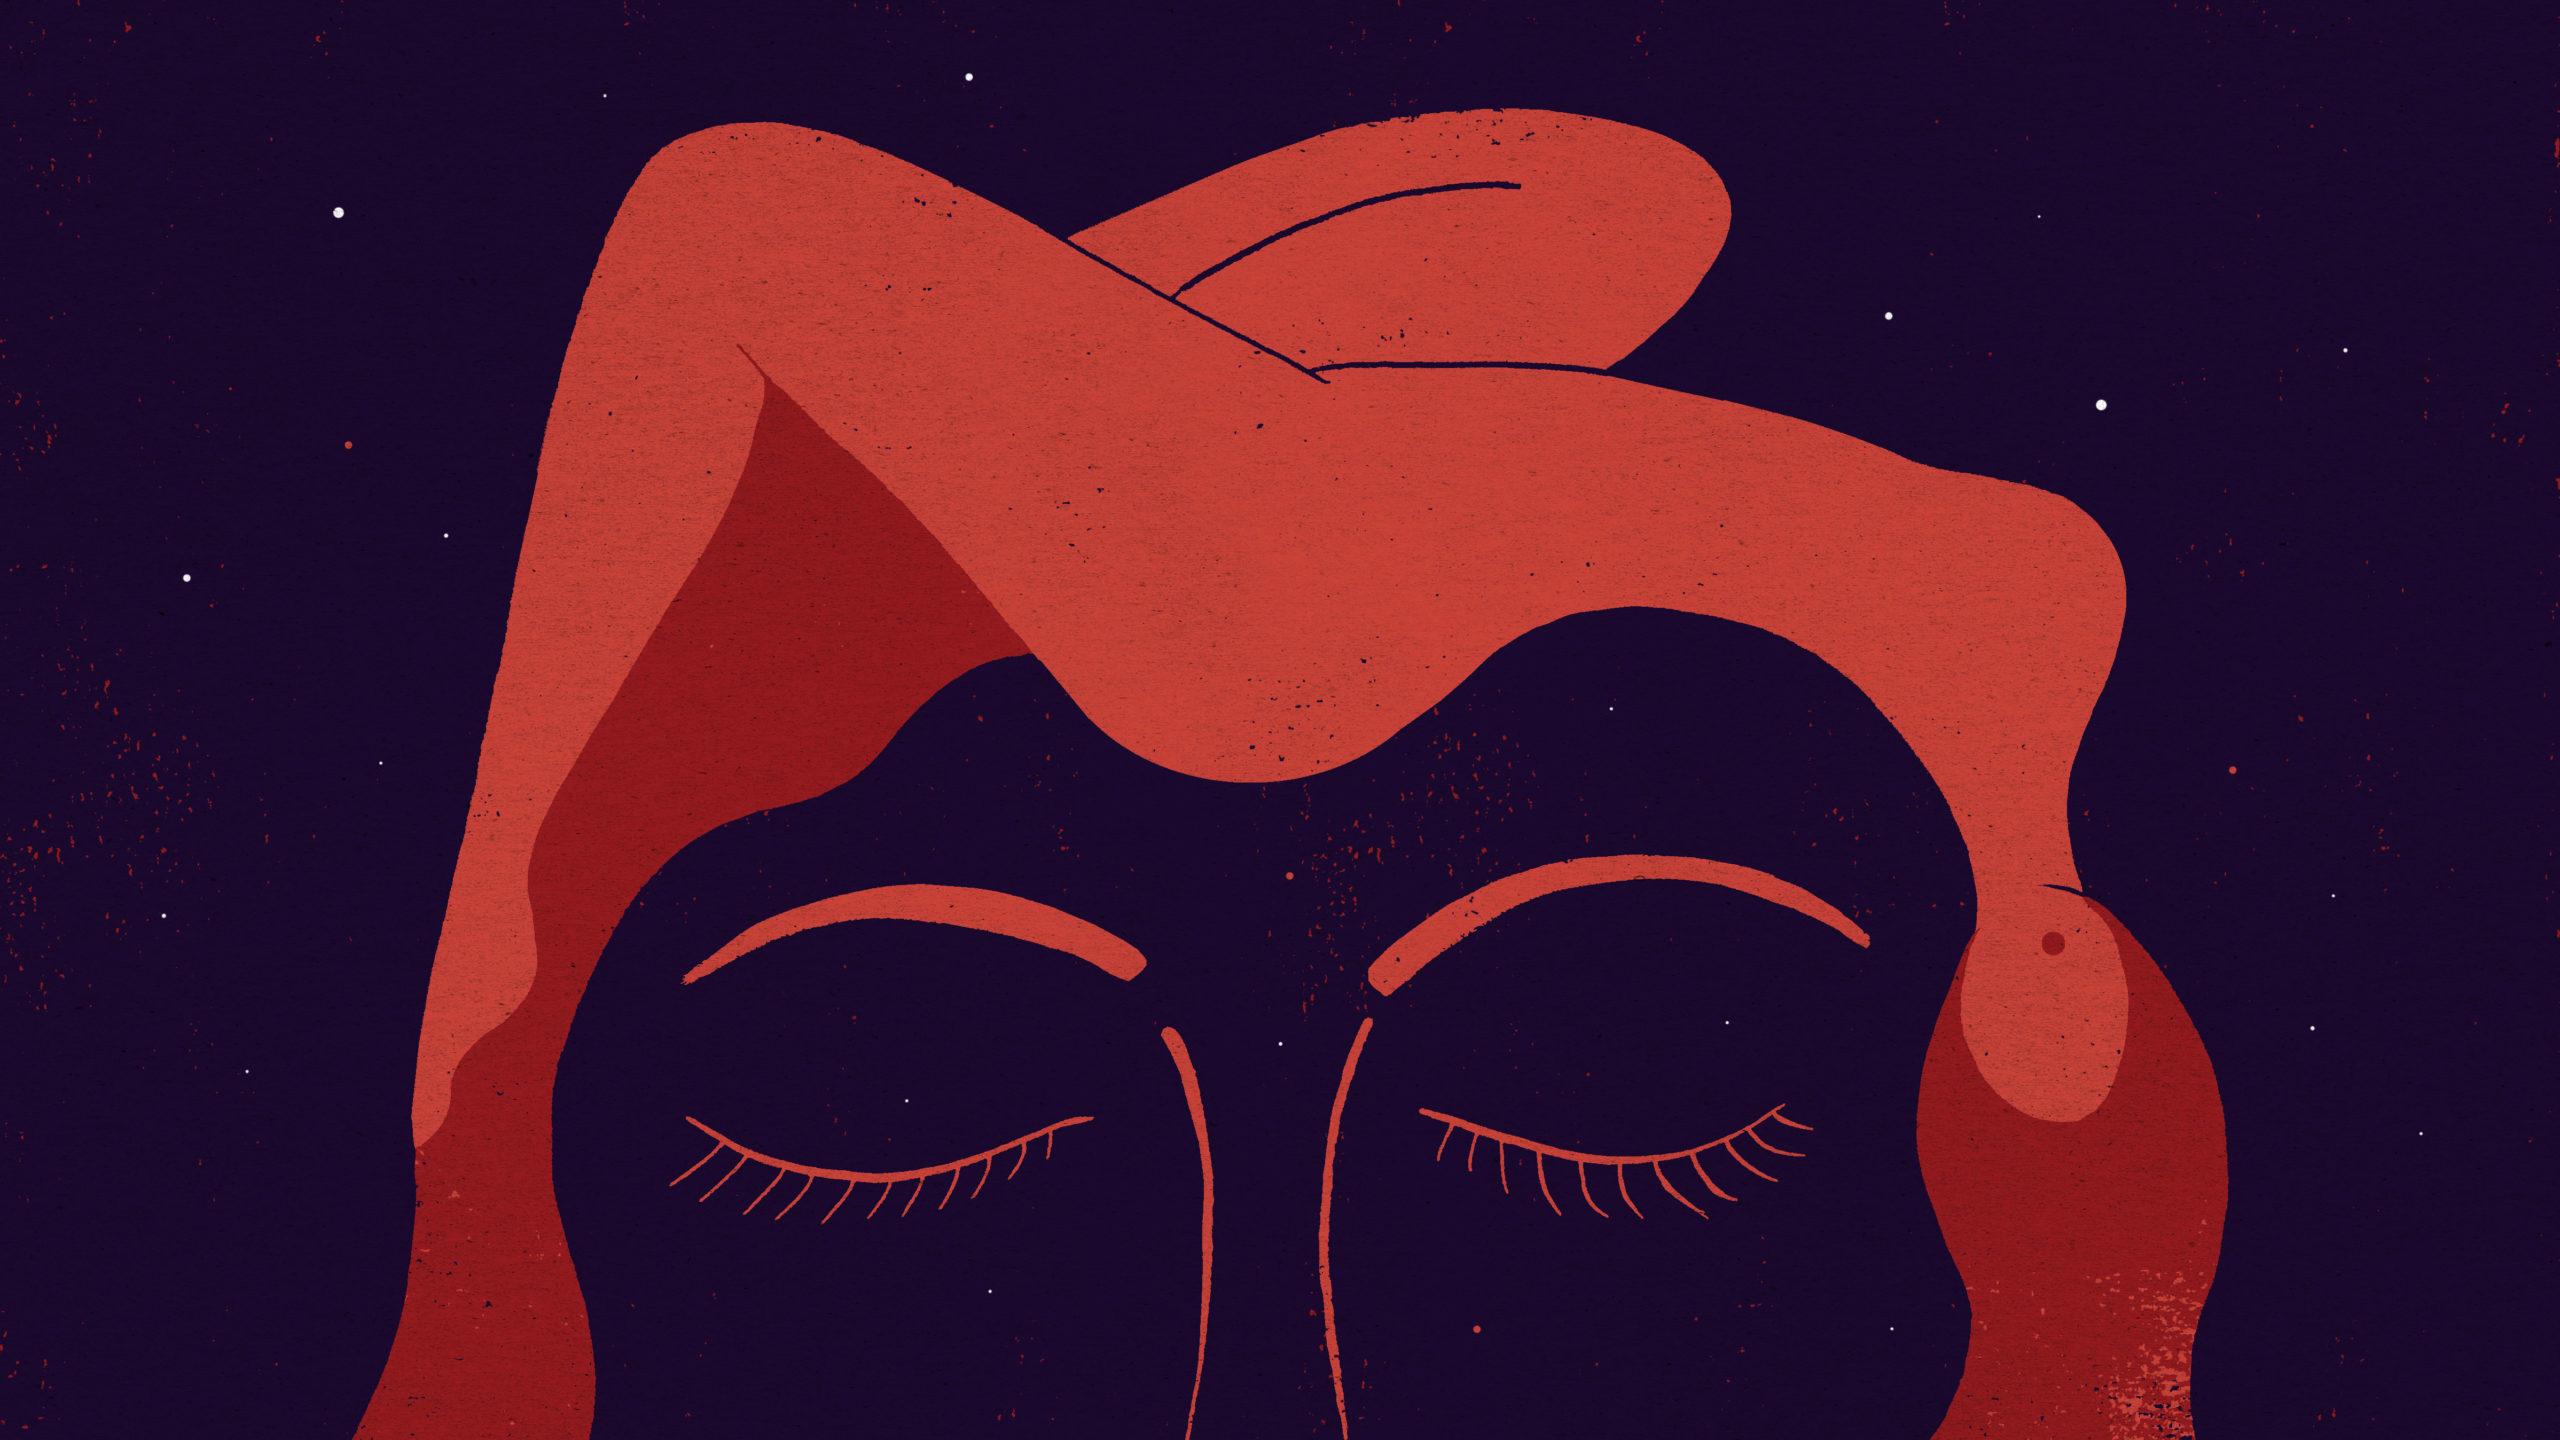 Иллюстрация —Hanna Barczyk.